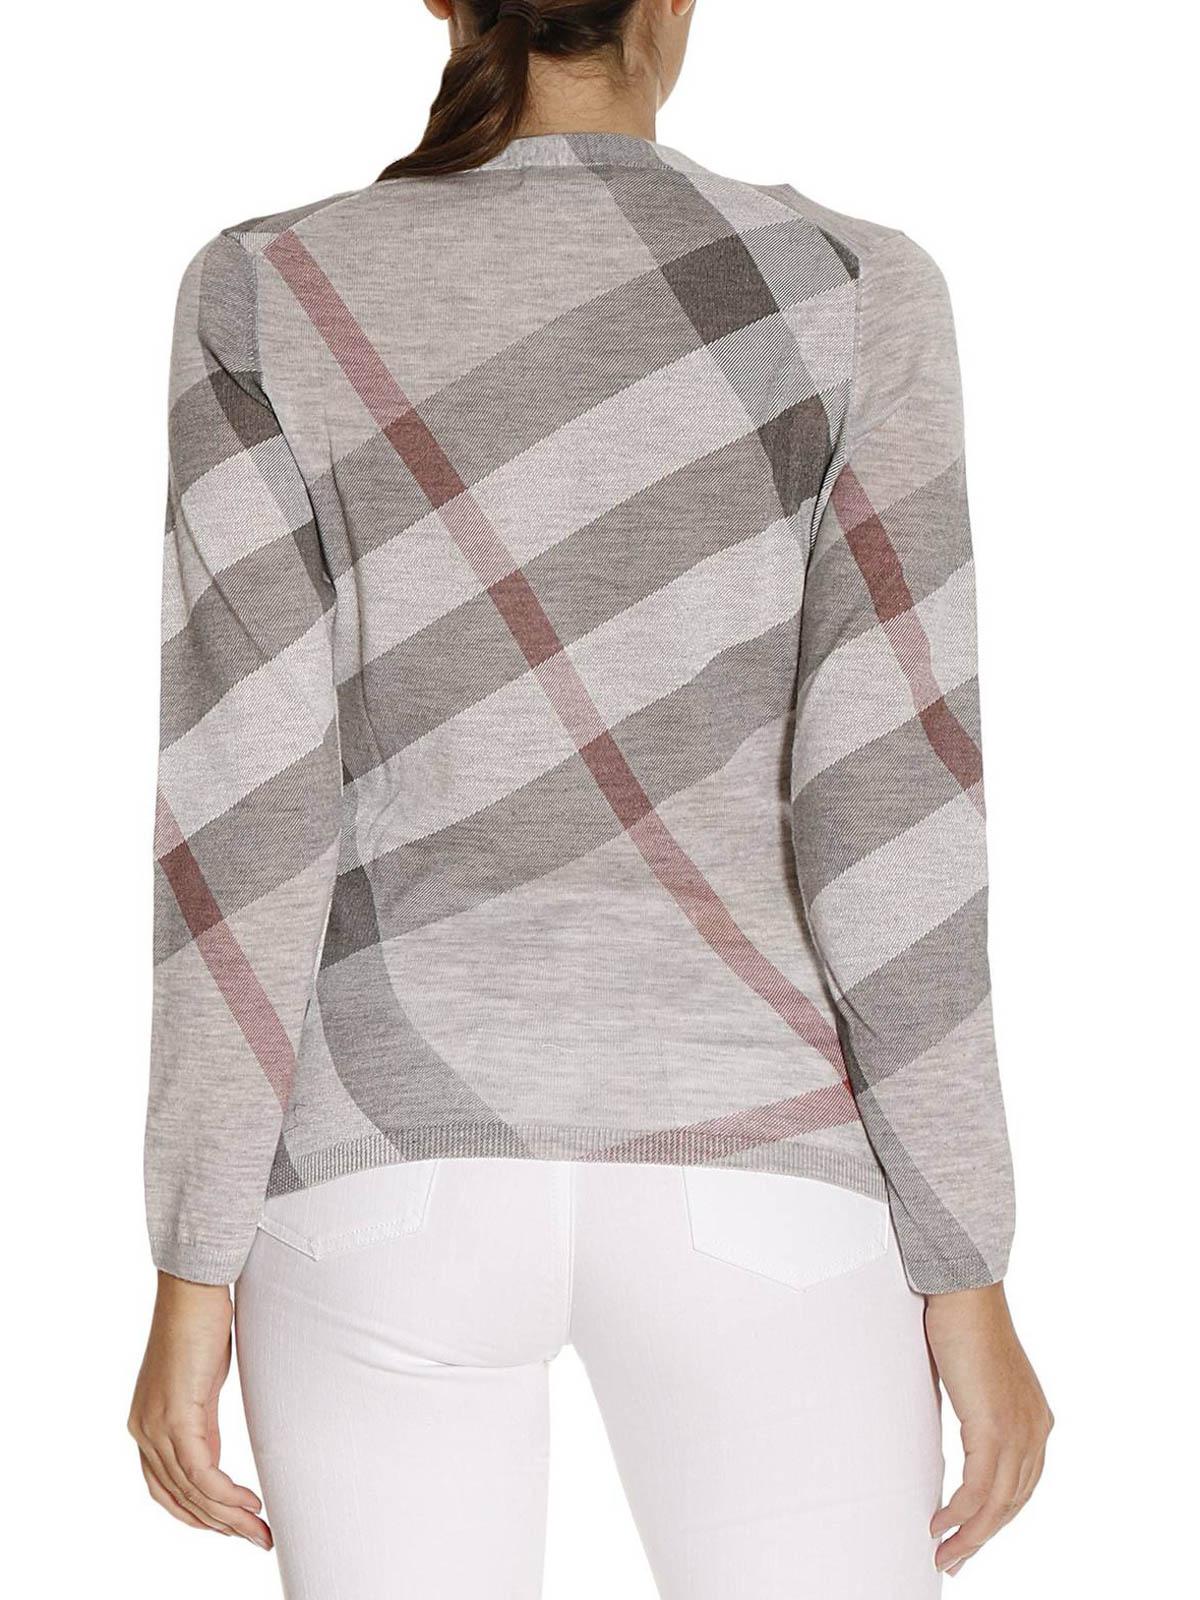 3553e45c8547b Burberry - Cardigan Gris Pour Femme - Cardigans - 4037734   iKRIX.com